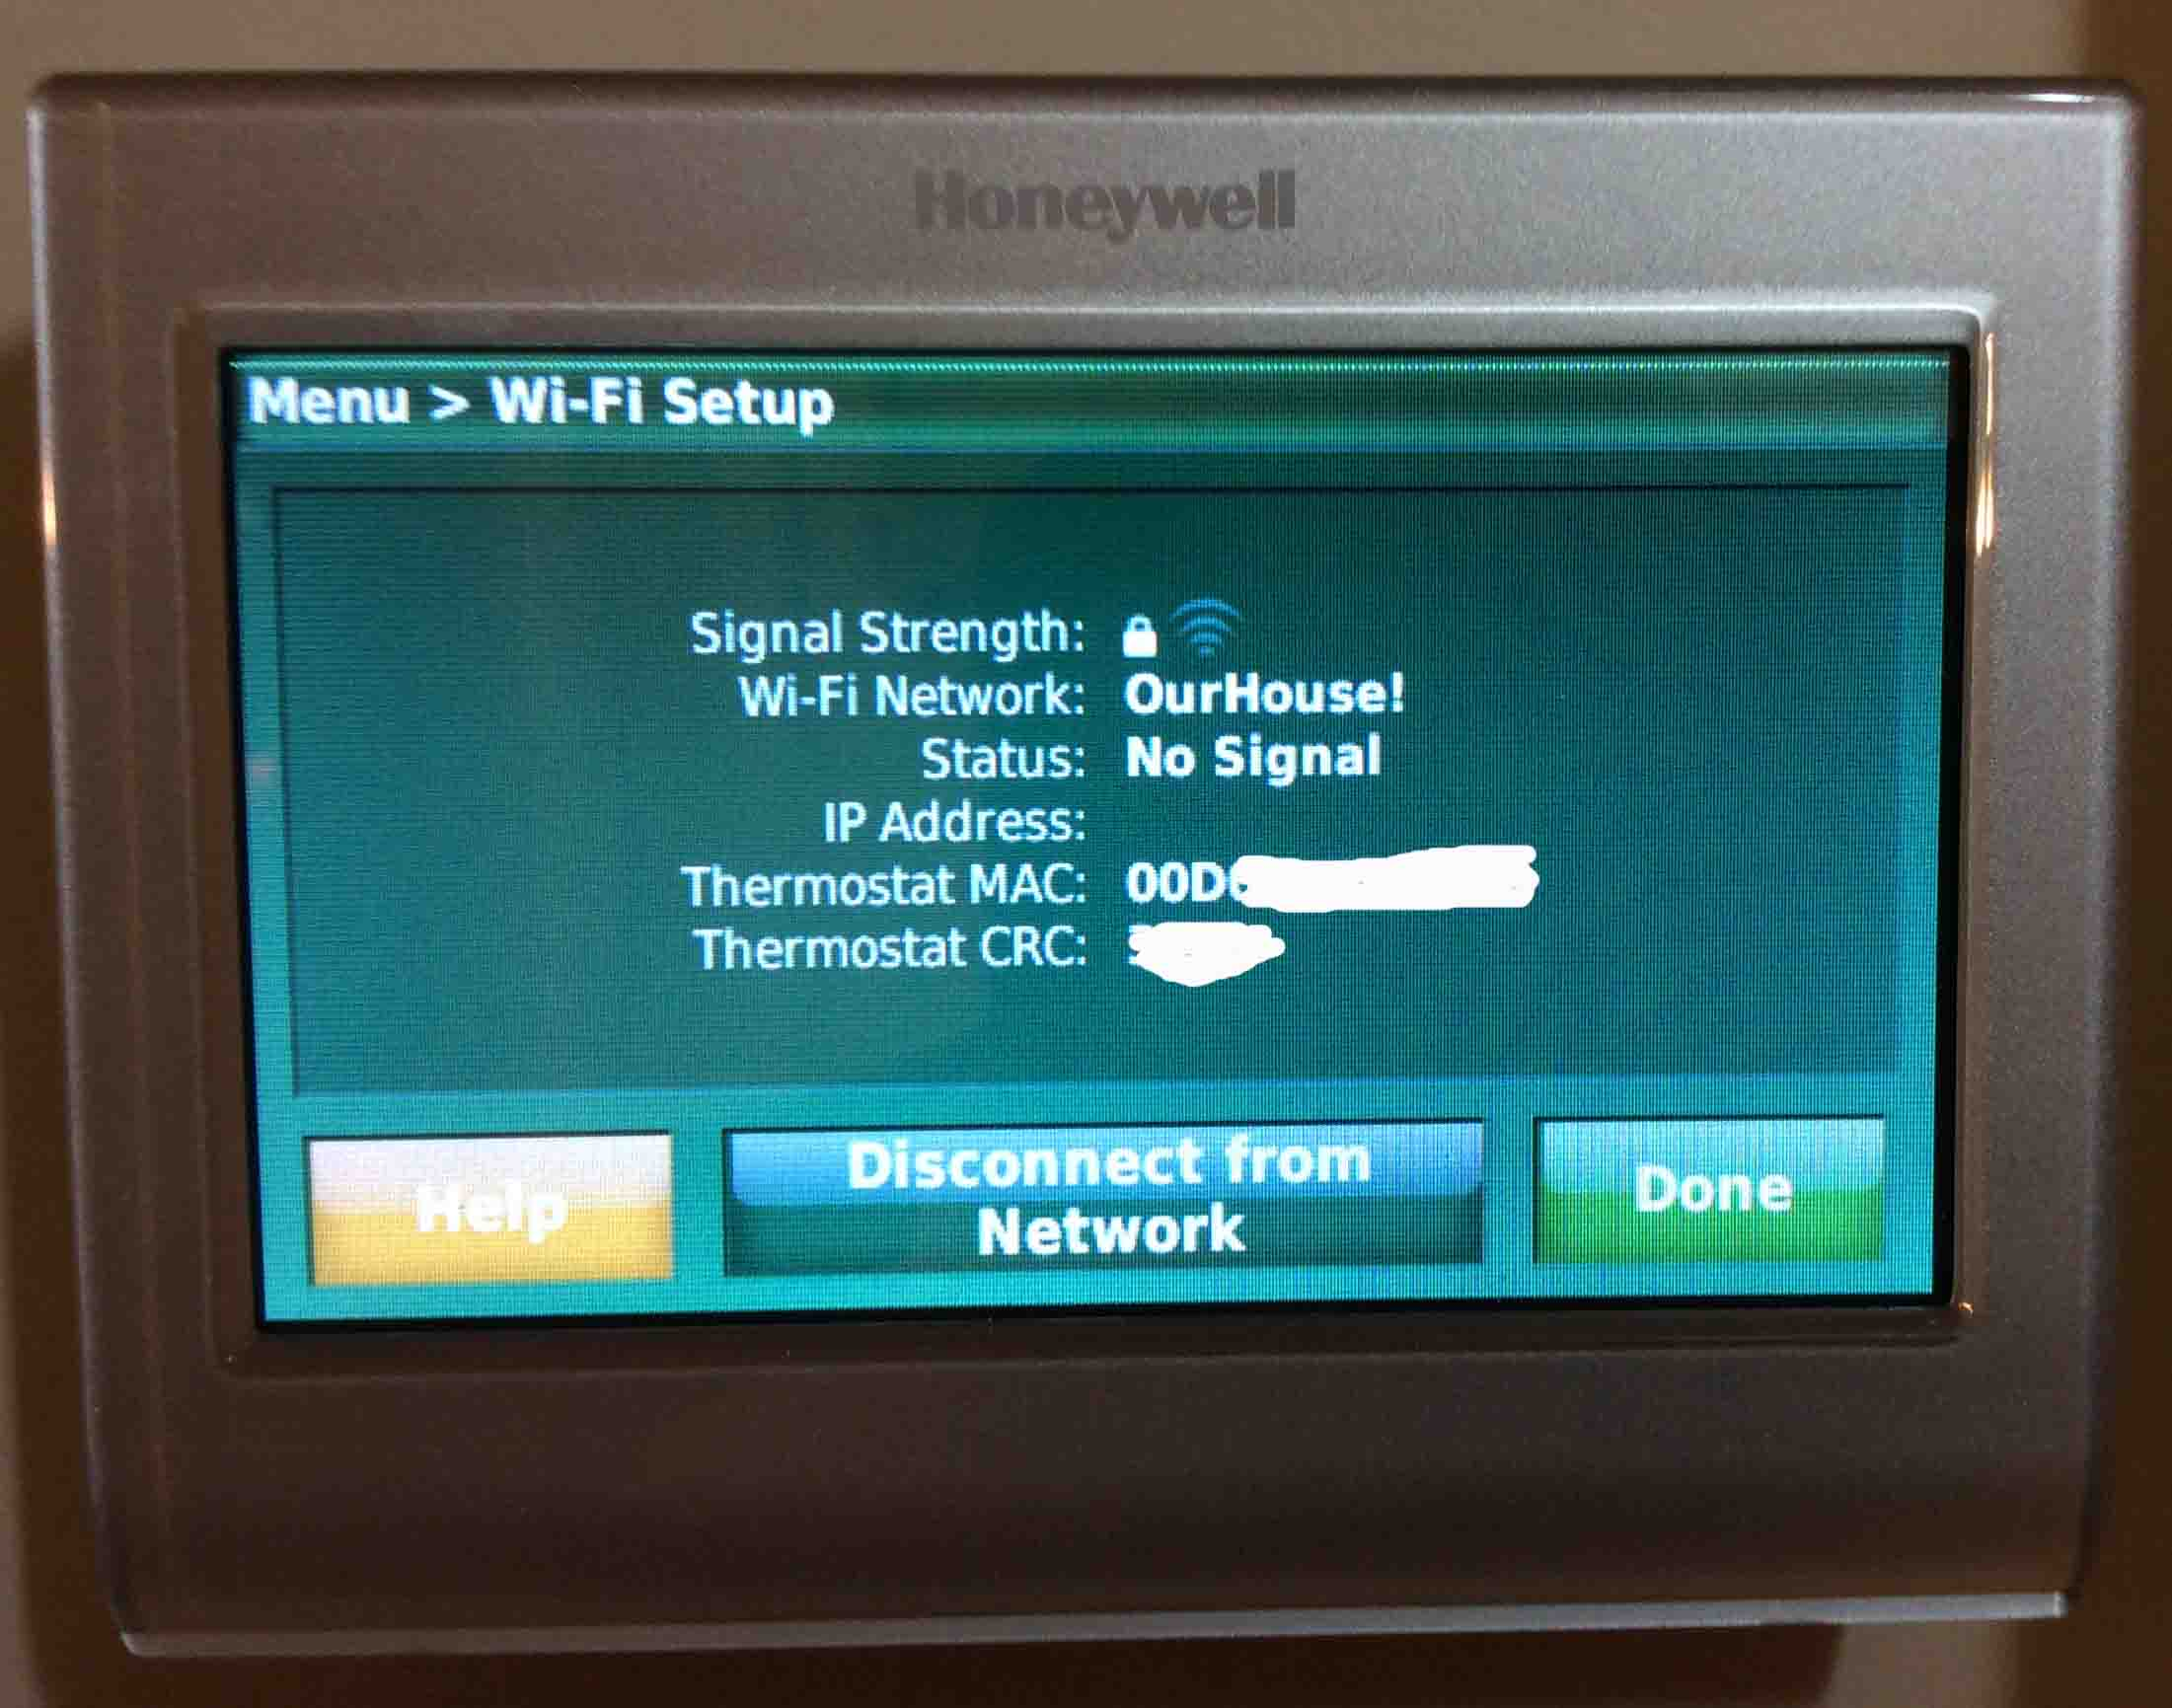 honeywell wifi thermostat rth6580wf wiring diagram rockford fosgate speaker electrical 9580 ruud heat pump ~ elsavadorla